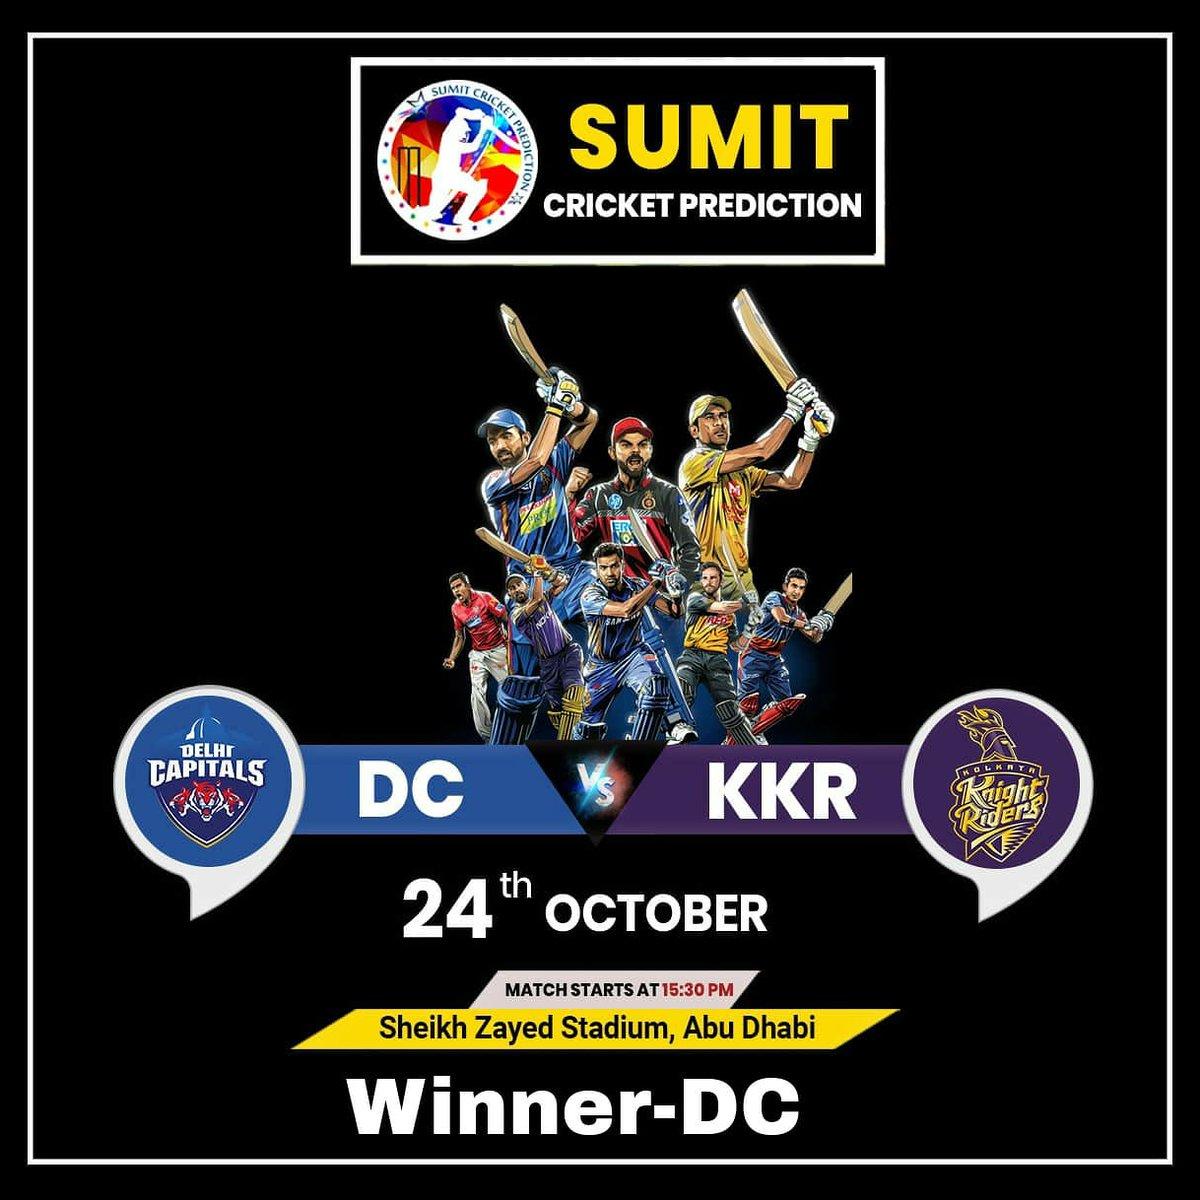 🏏   #IPL2020BigBlast 🏏  🏏 #DC Vs #KKR 🏏 ⚜️ Winner-#DehliCapitals ⚜️   #IplT20 #Sumitprediction #Prediction #FreeTips #CricketPrediction  #IPL2020 #IPL  #TodayPrediction #BestTipper #CPL #Tipper  #FreeReport #CricketReport #MumbaiIndians #CKR #CSK #RR #KKR #DP #KXIP #SRH https://t.co/gwdC1KnS0g